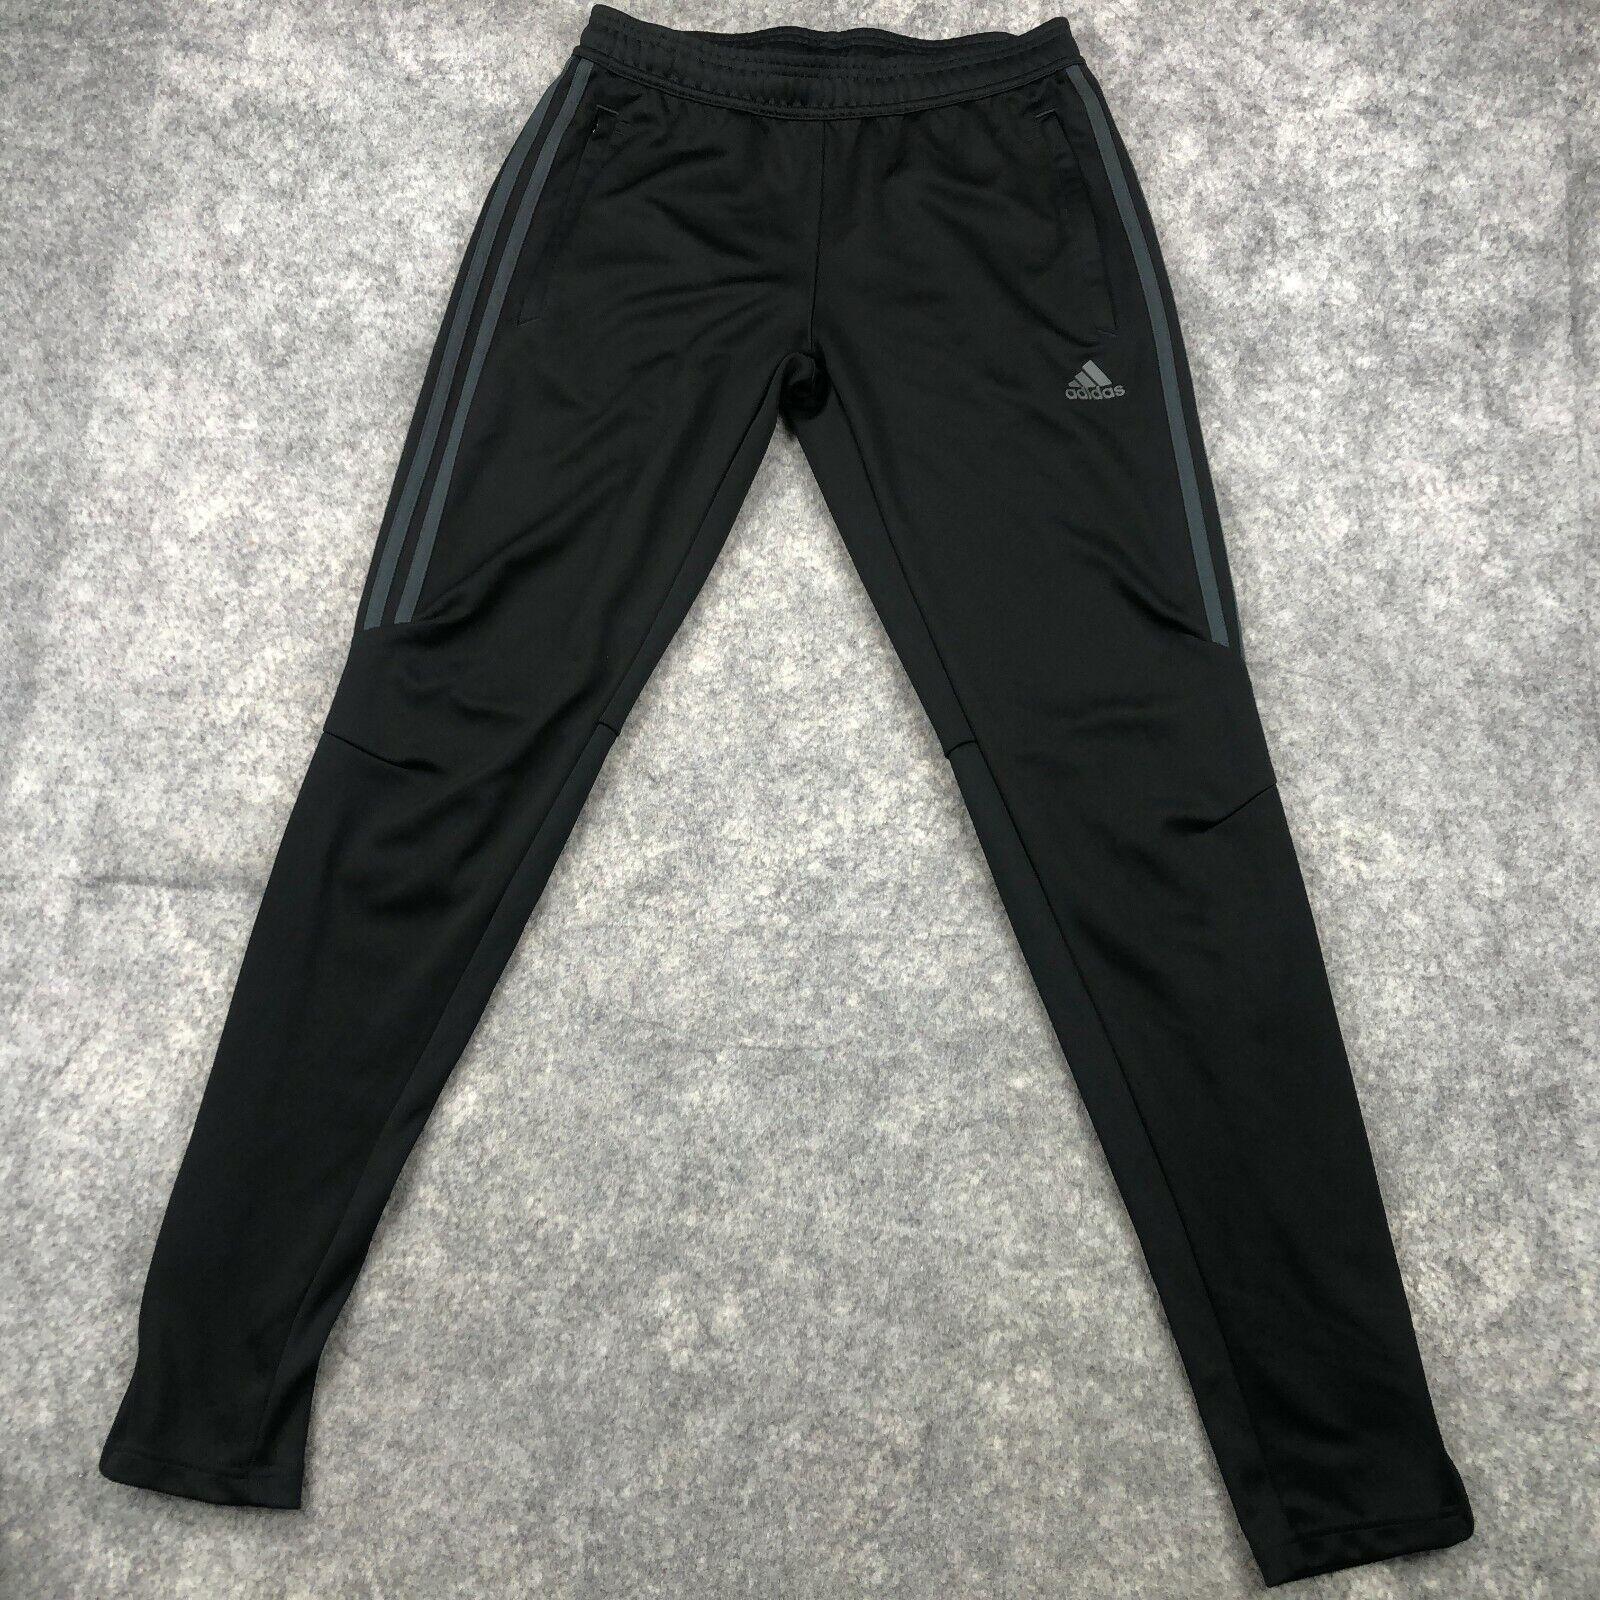 Adidas Sweatpants Womens Small Black Solid Track Pants Ladies Climacool b30